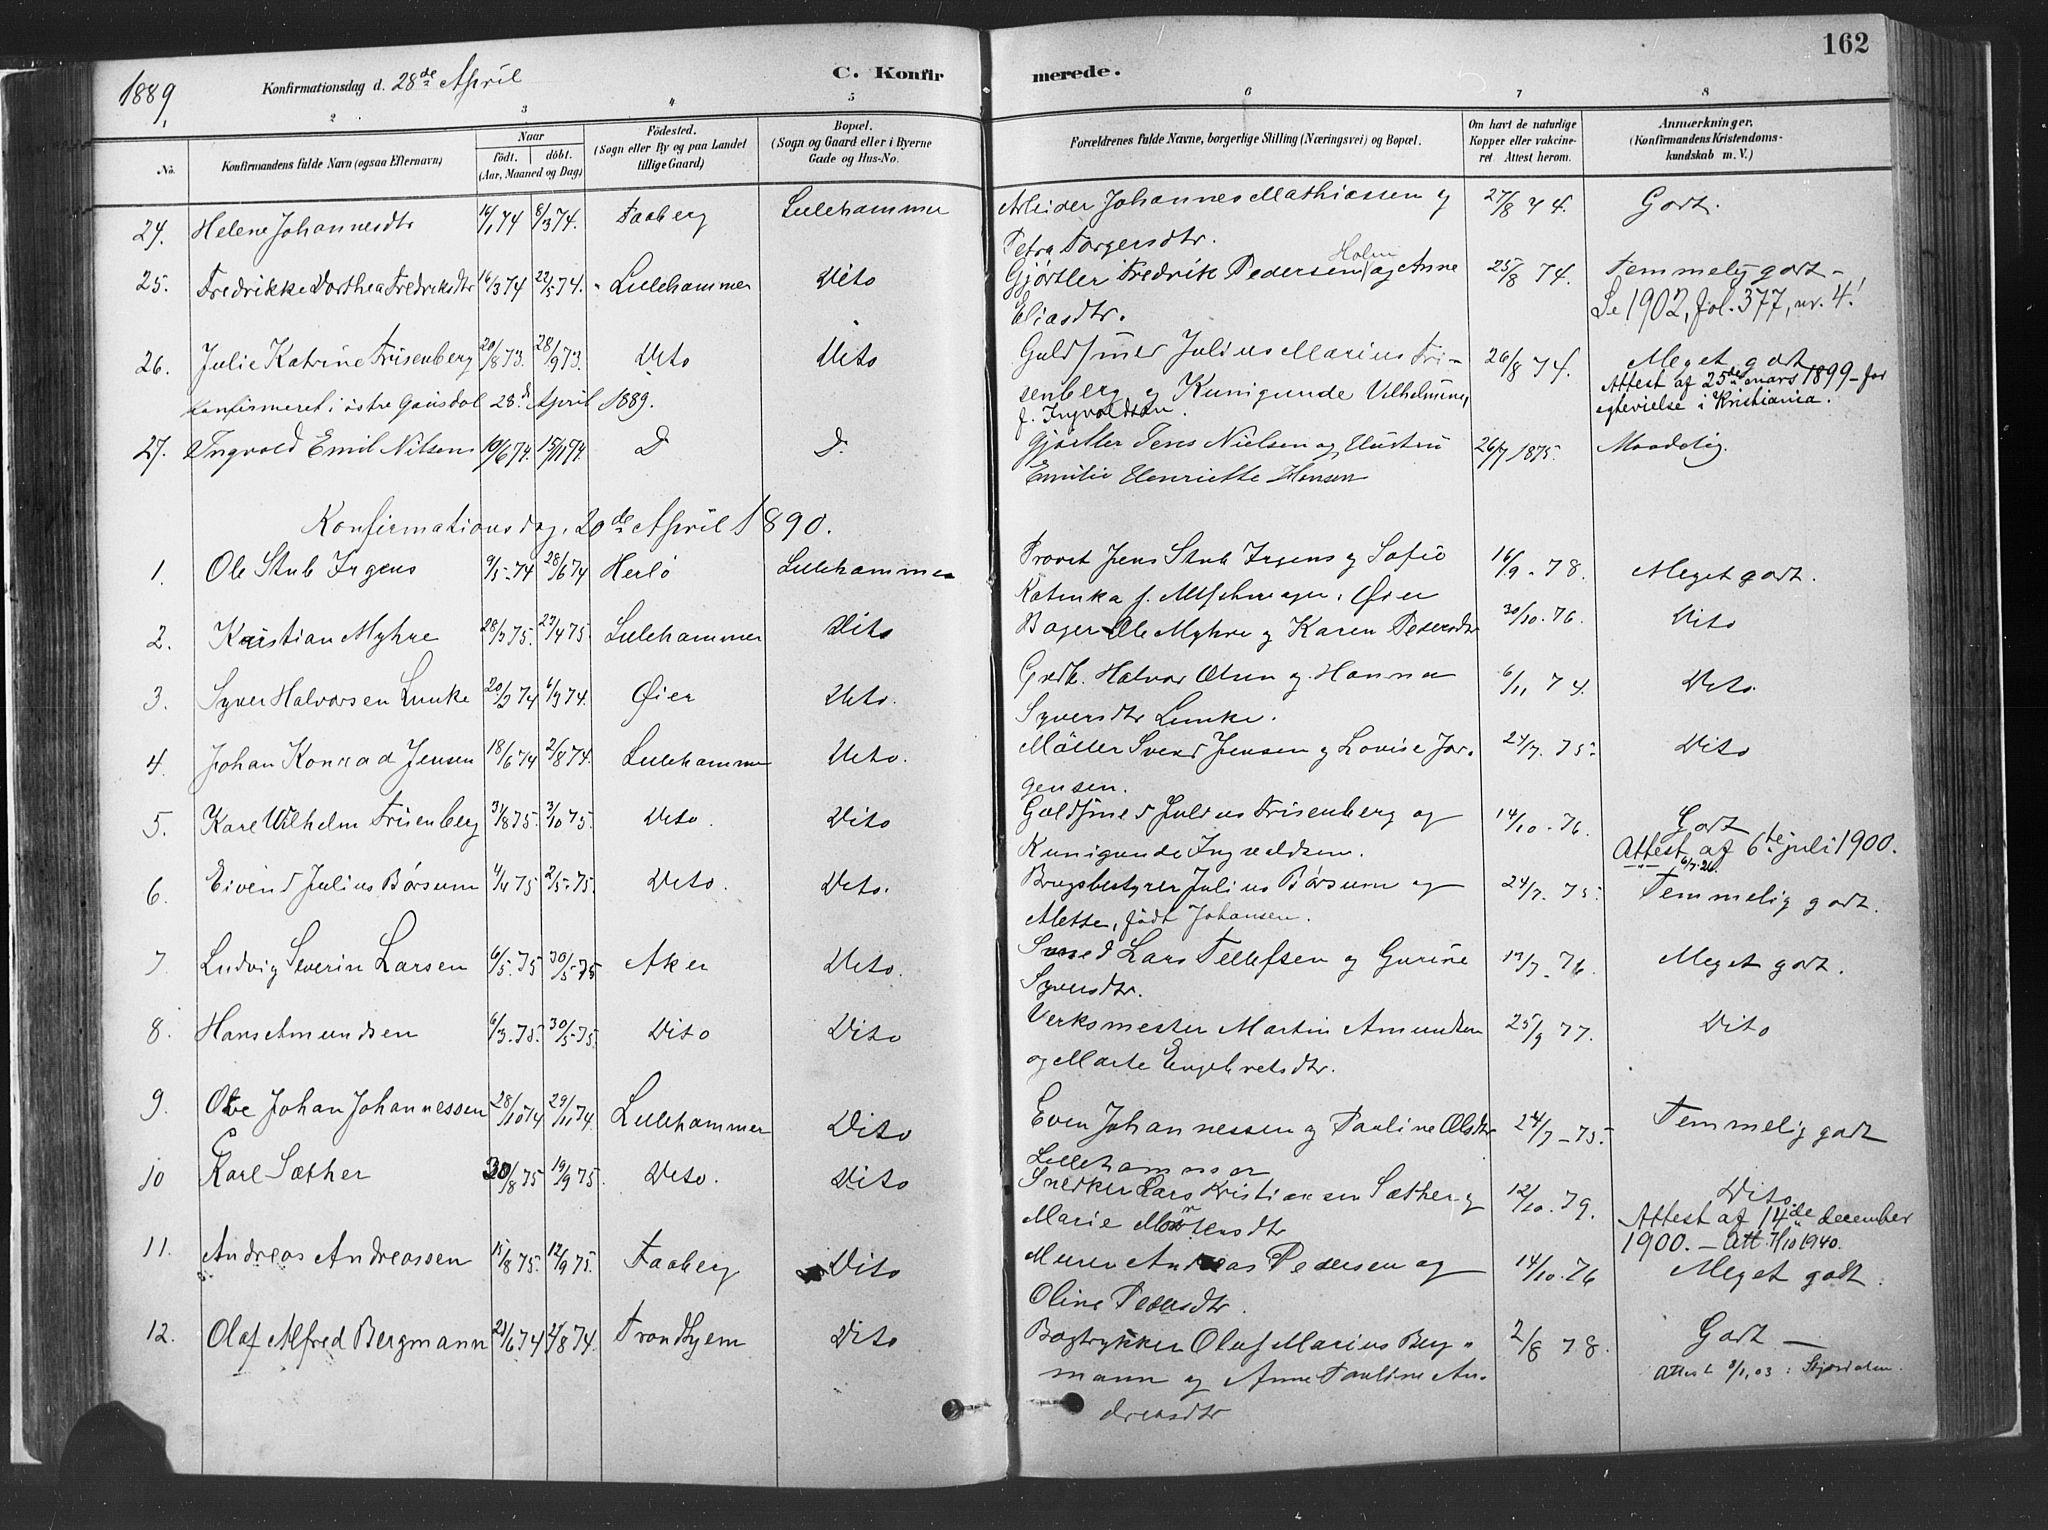 SAH, Fåberg prestekontor, Ministerialbok nr. 10, 1879-1900, s. 162